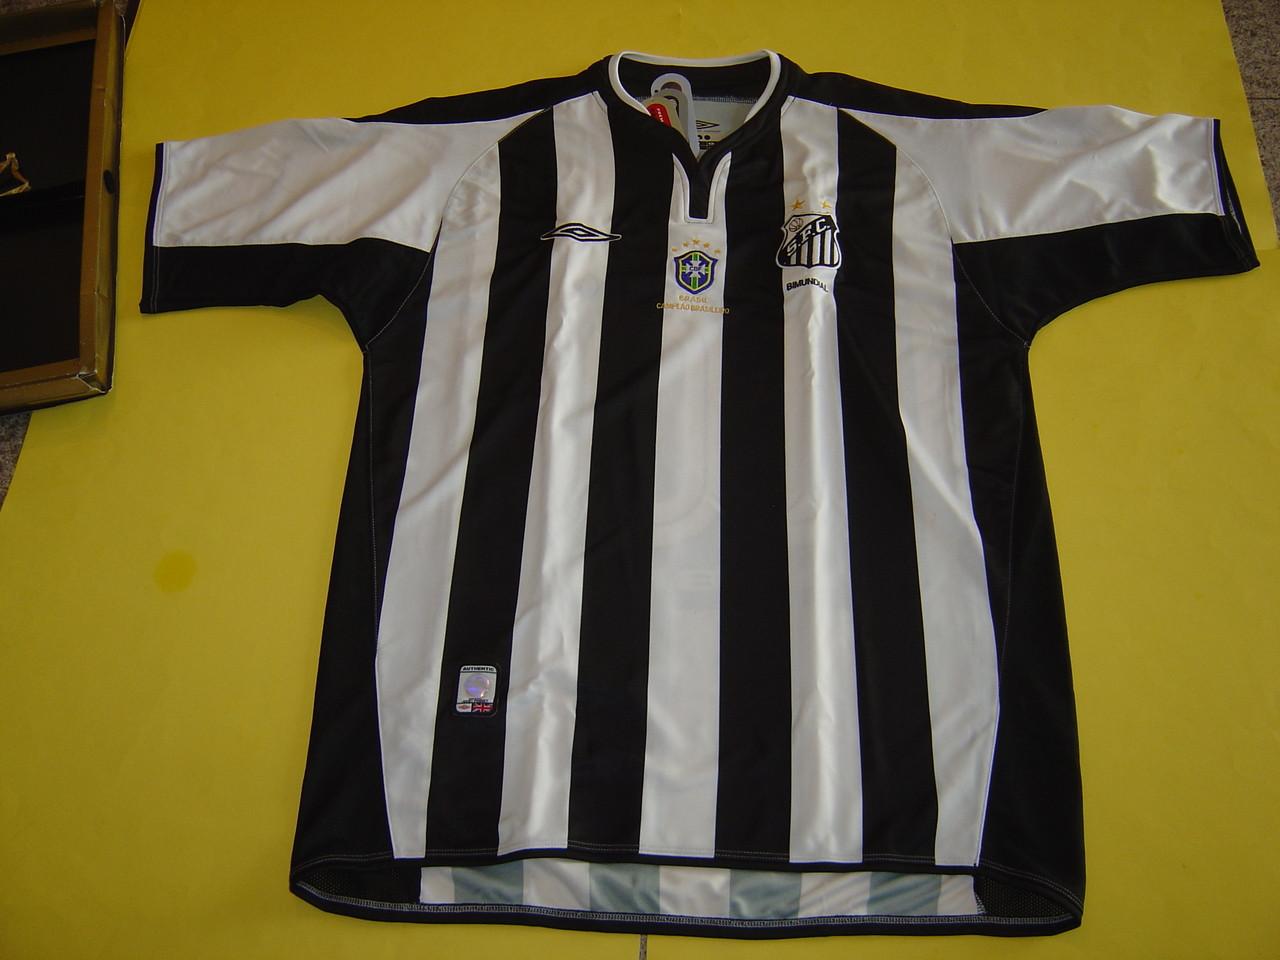 5277b6165ce UMBRO SANTOS FC 2005 AWAY JERSEY #10 - Soccer Plus